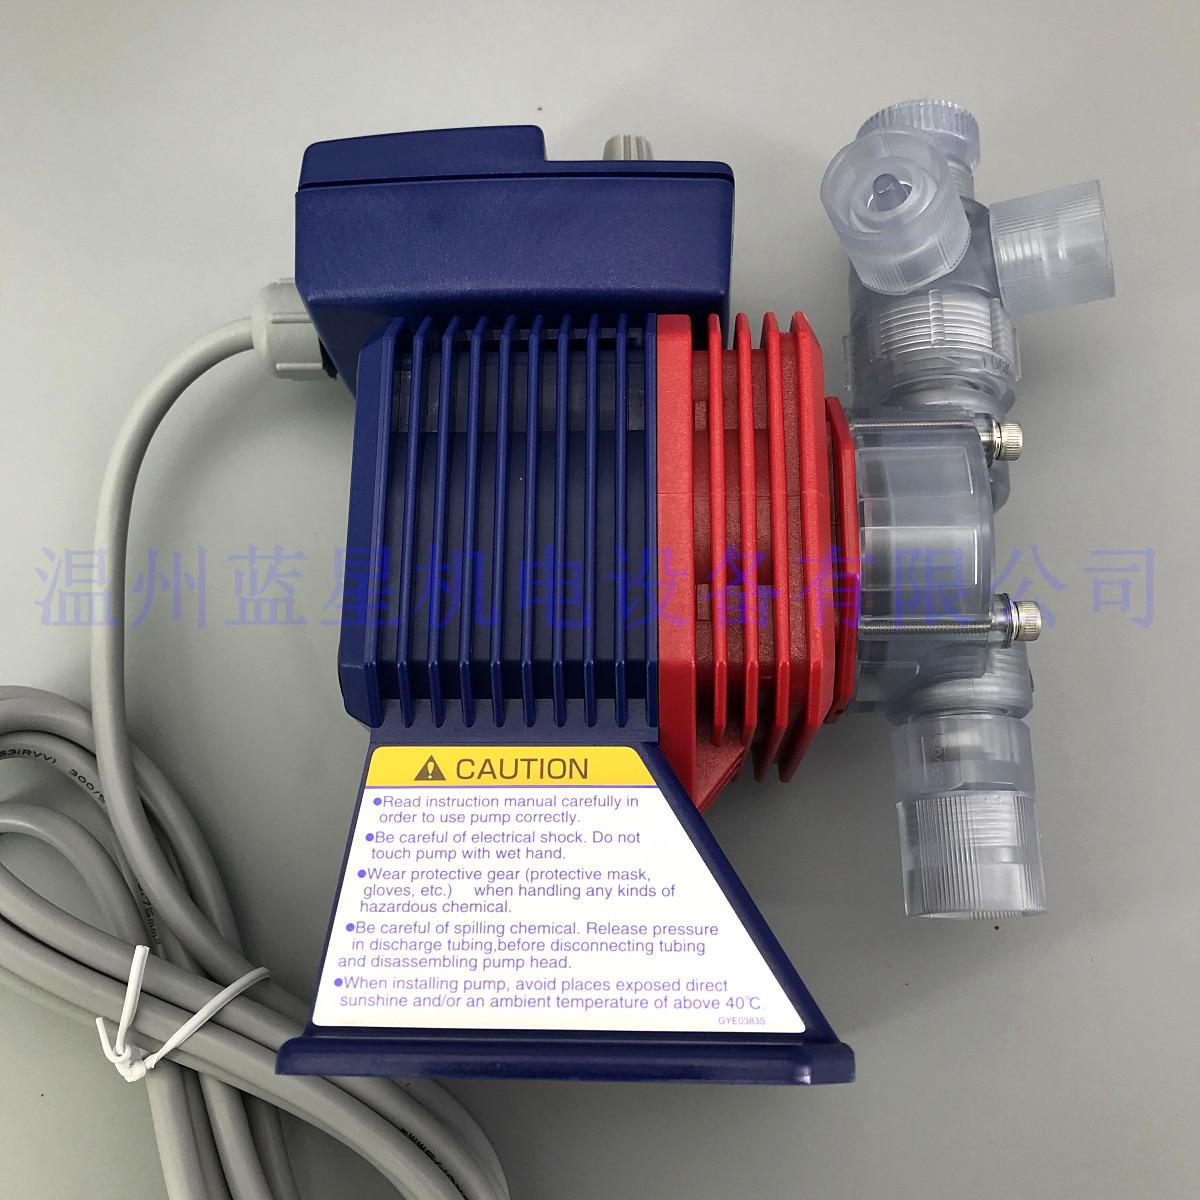 Japan imported (Yi Weiqi) electromagnetic metering pump ES-B11VC-230N1 dosing pump